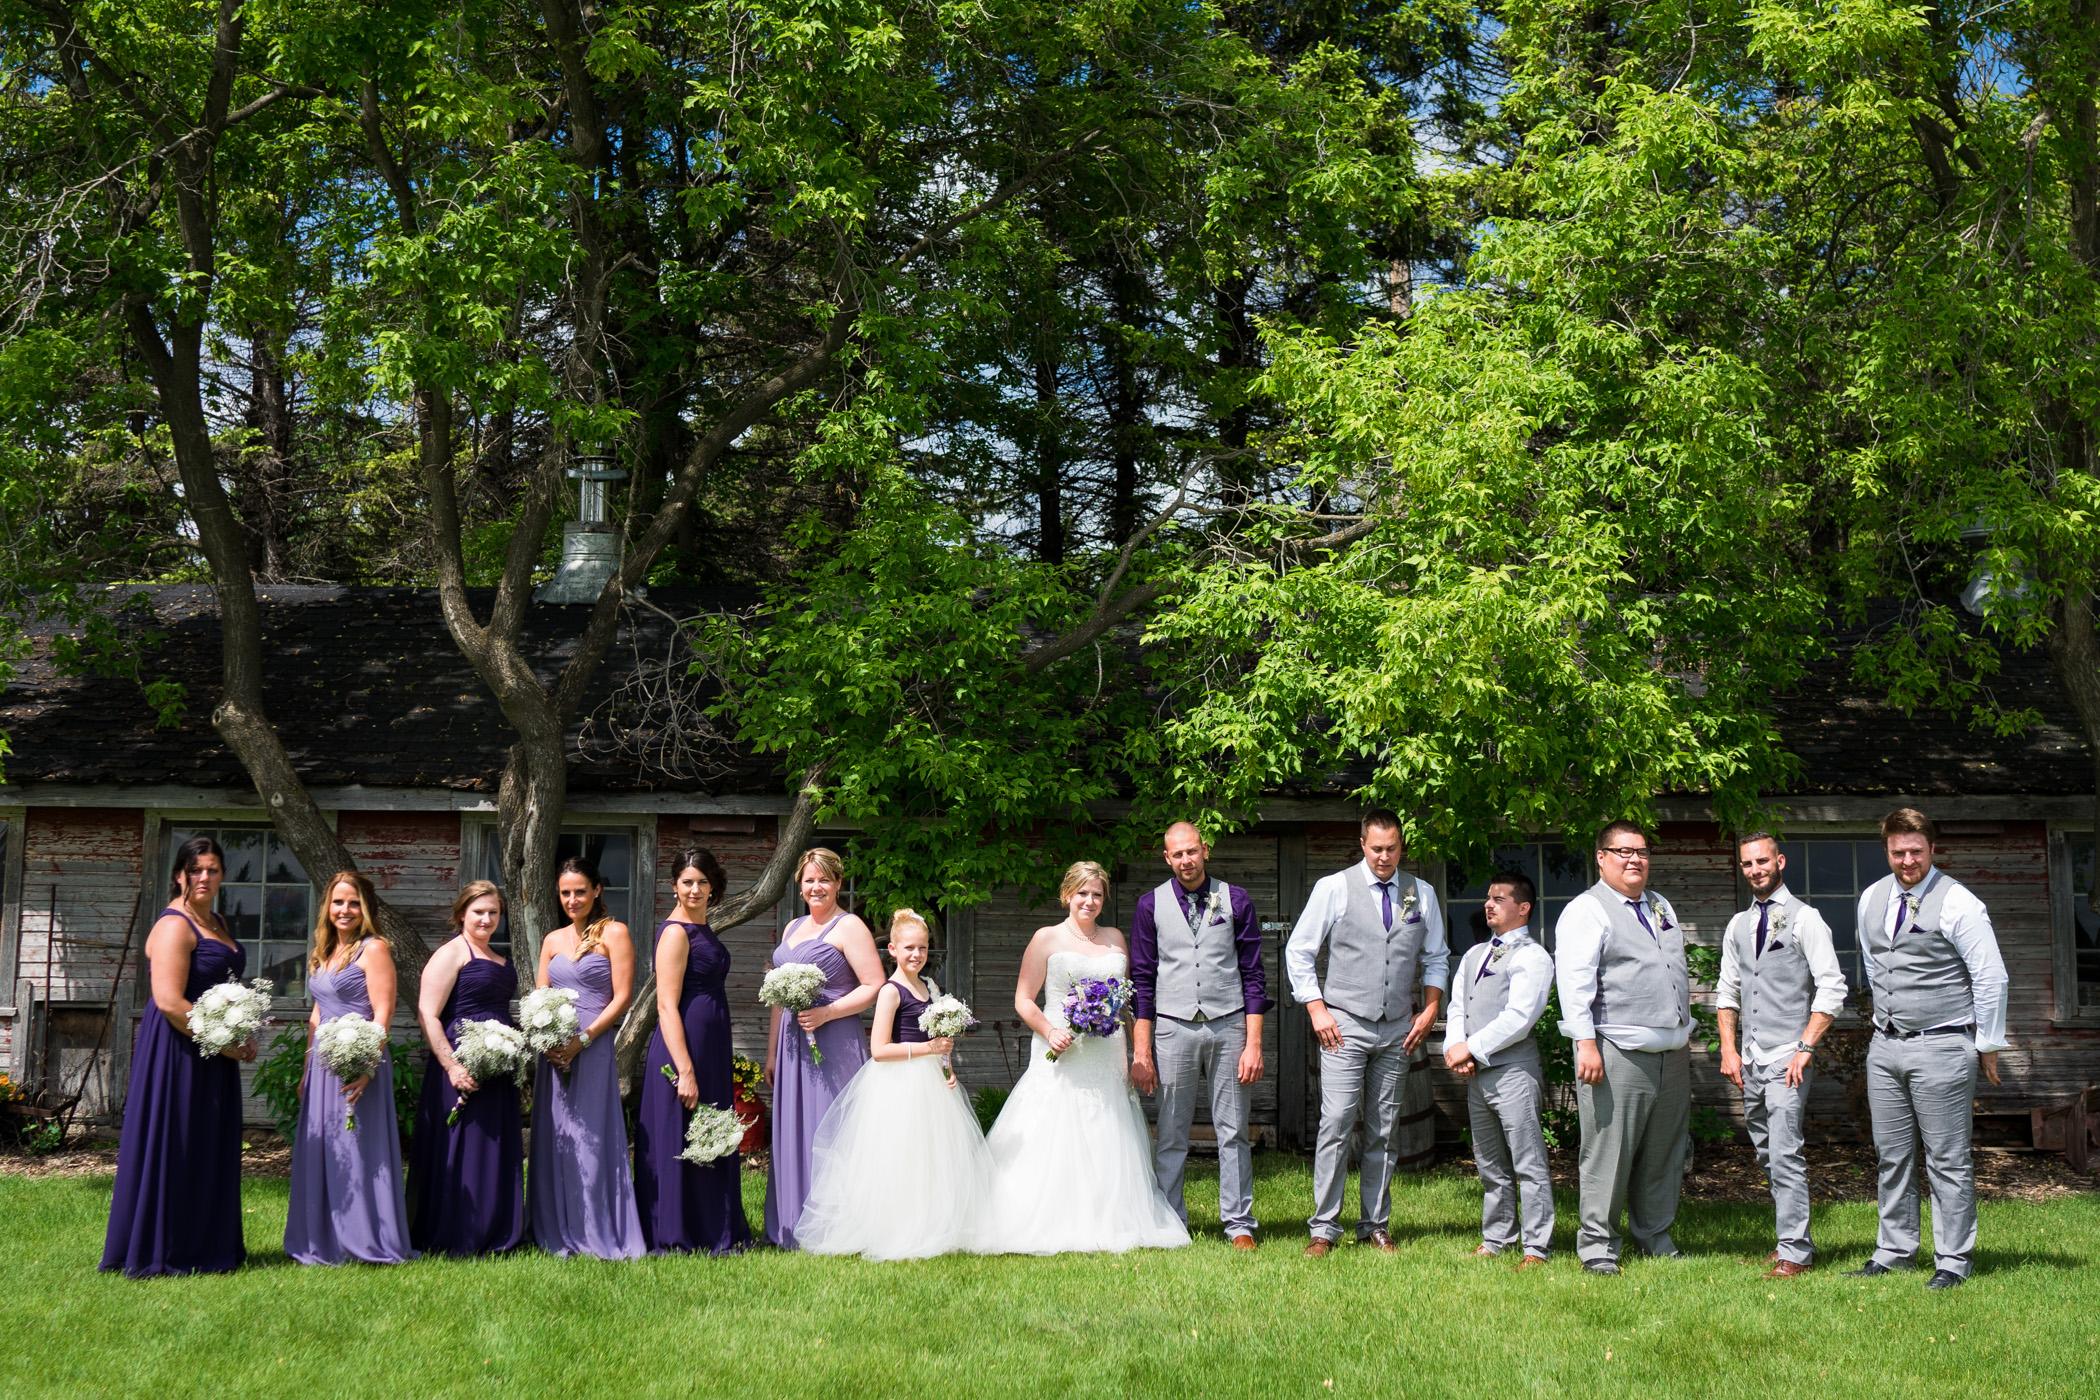 COJO Photo - Whitney and Steve - Wedding-640.jpg